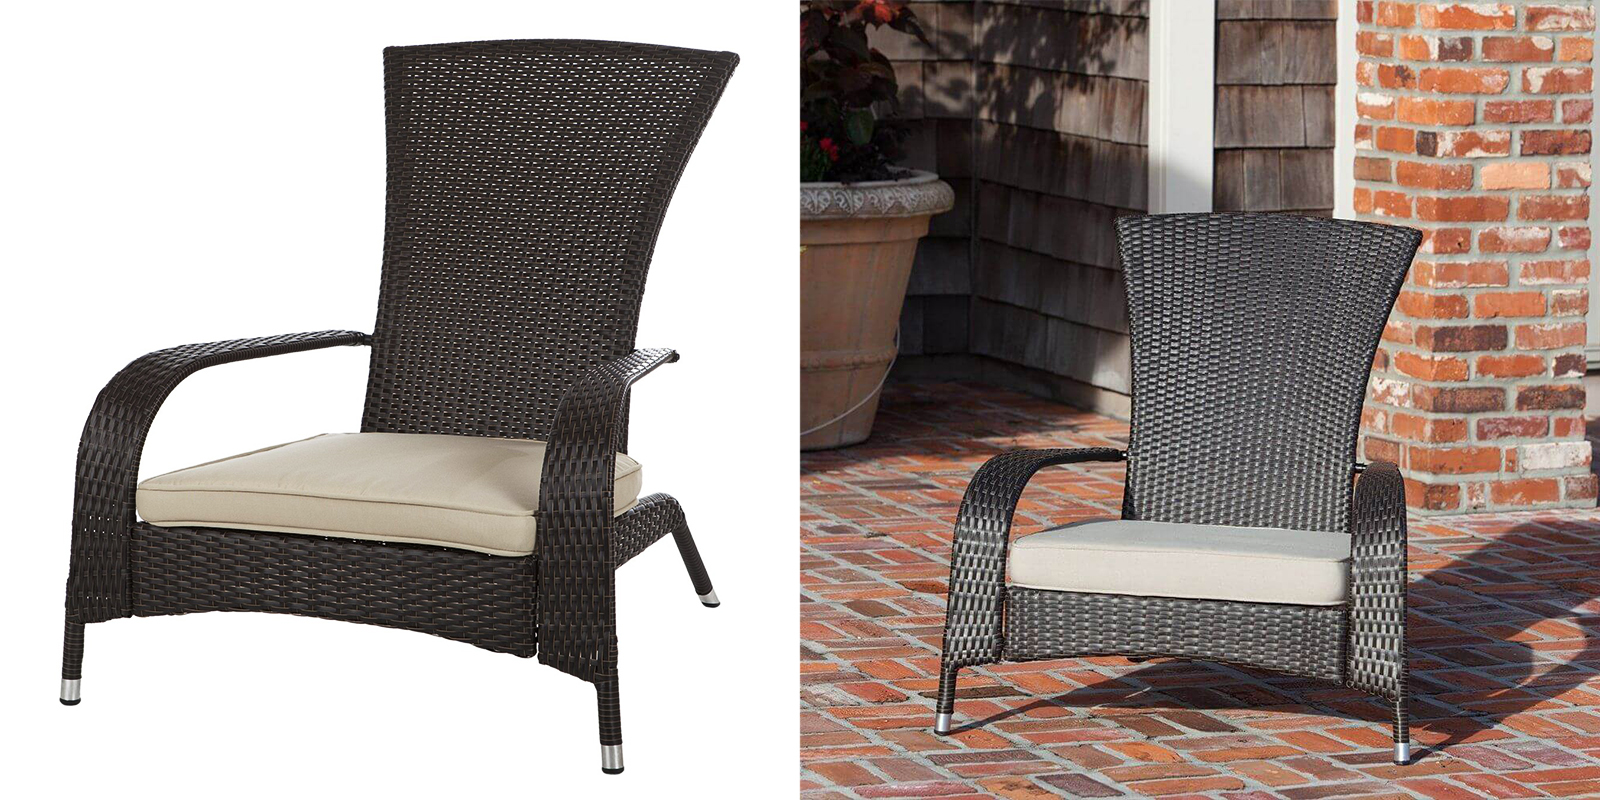 Patio Chair - Wicker Adirondack Chair